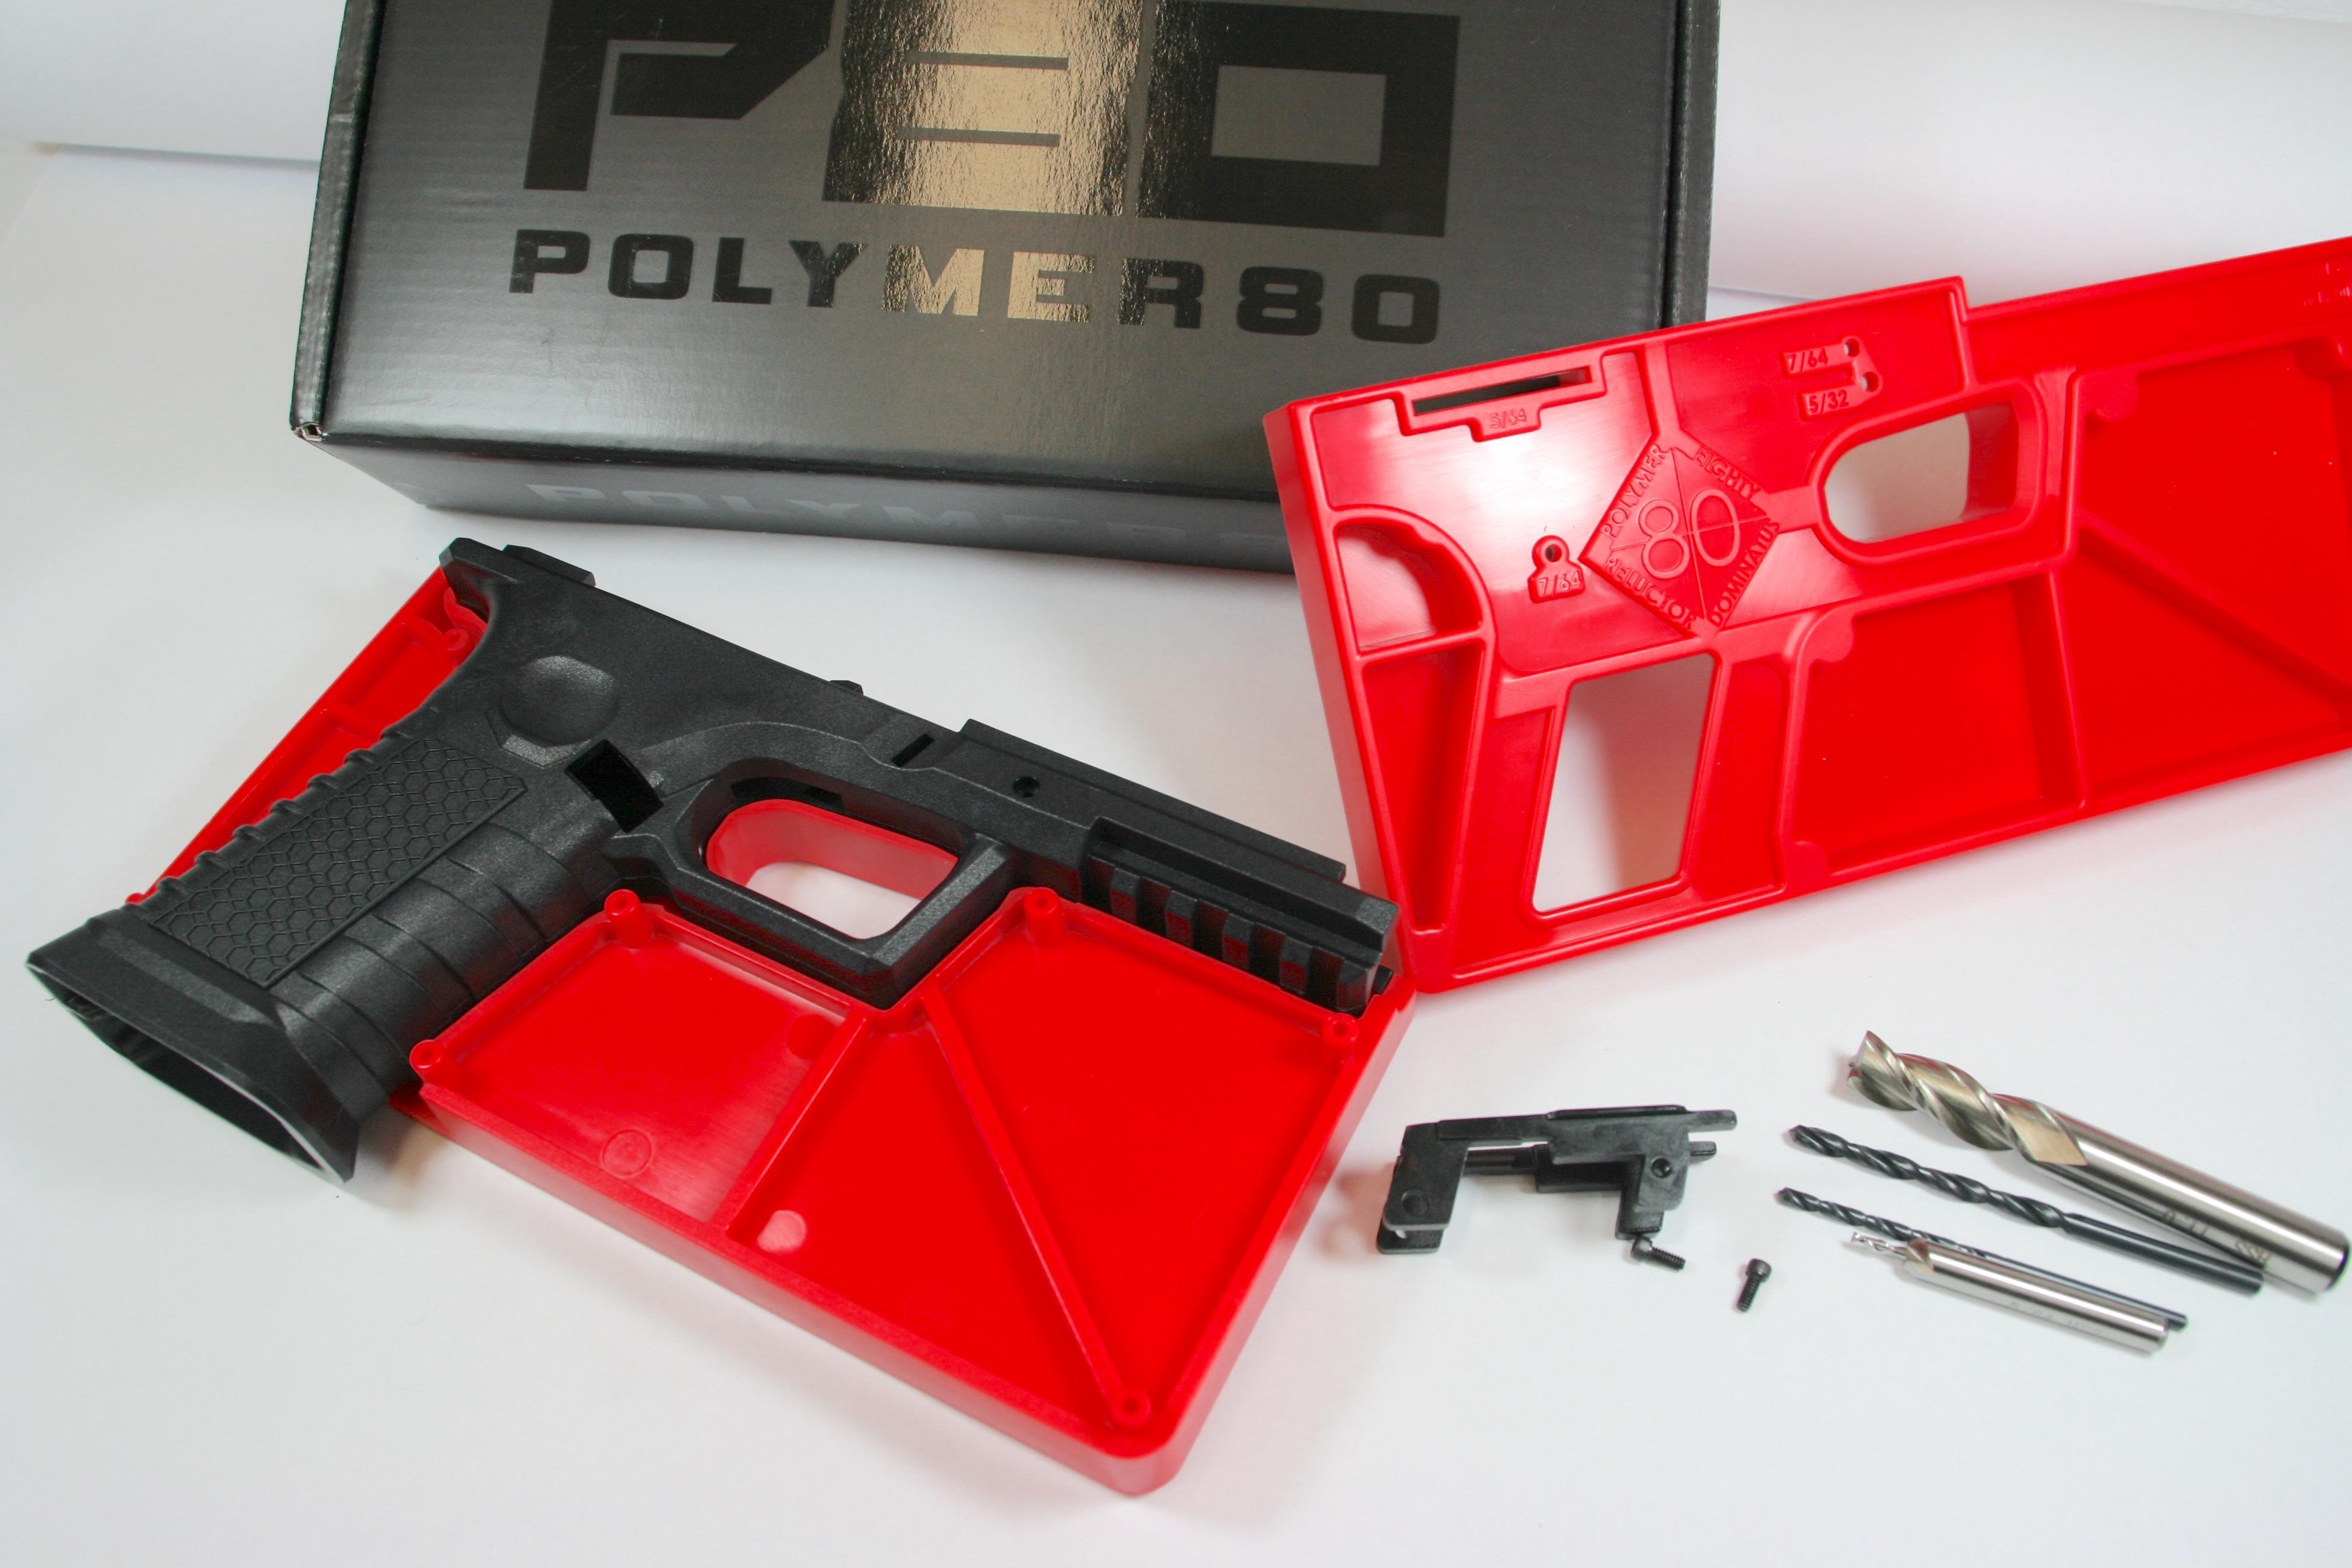 Polymer80 Spectre Ghost Pistol Build - GunsAmerica Digest